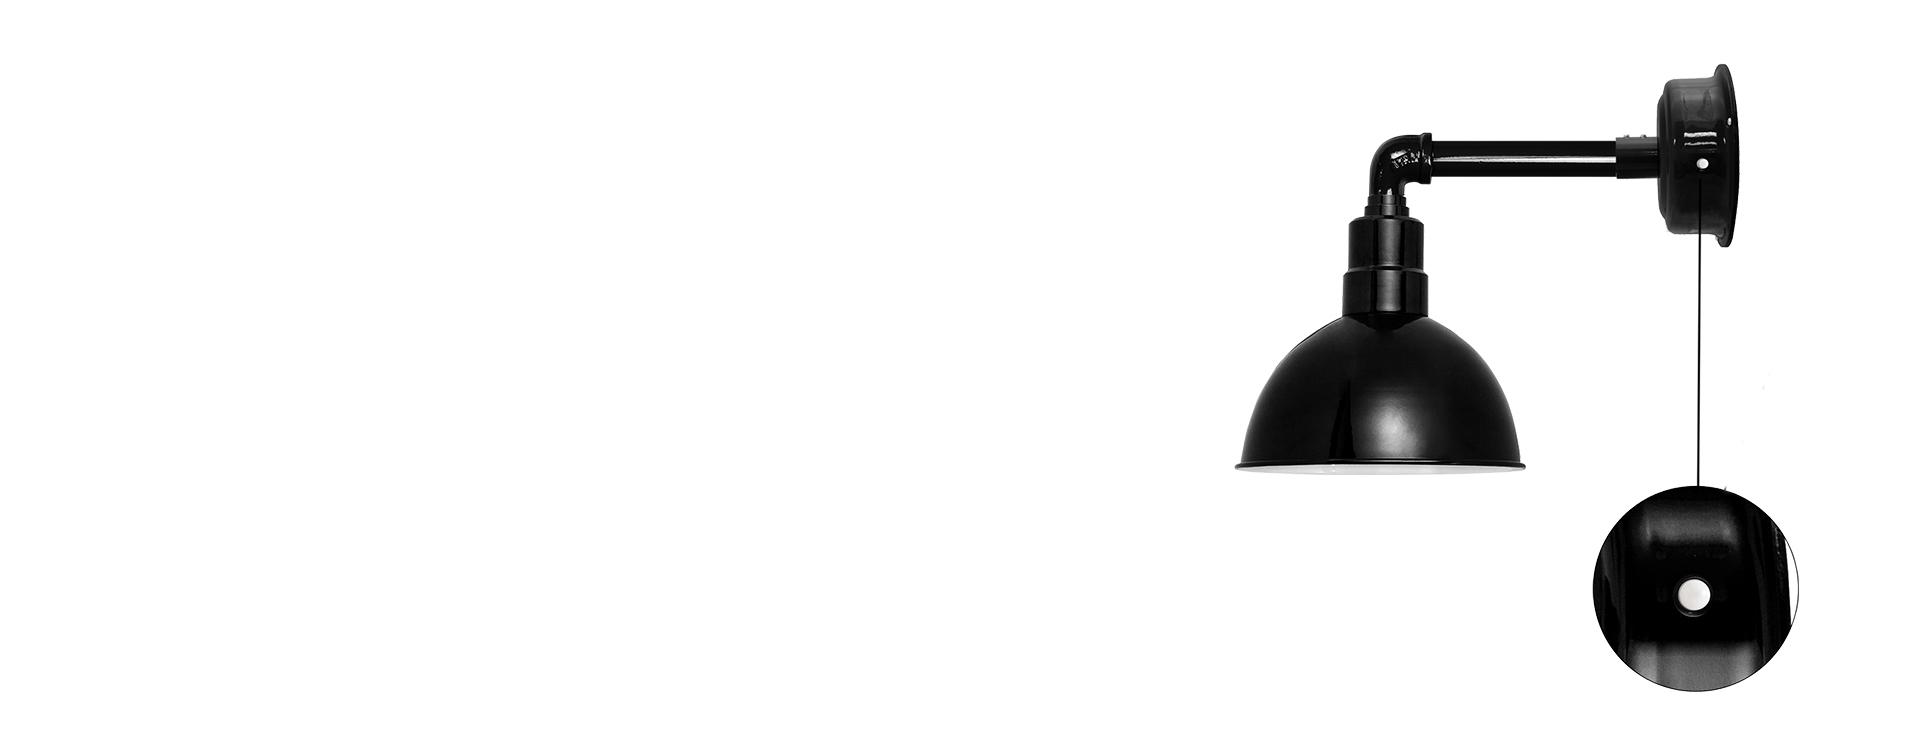 Blackspot LED Wall Sconce motion